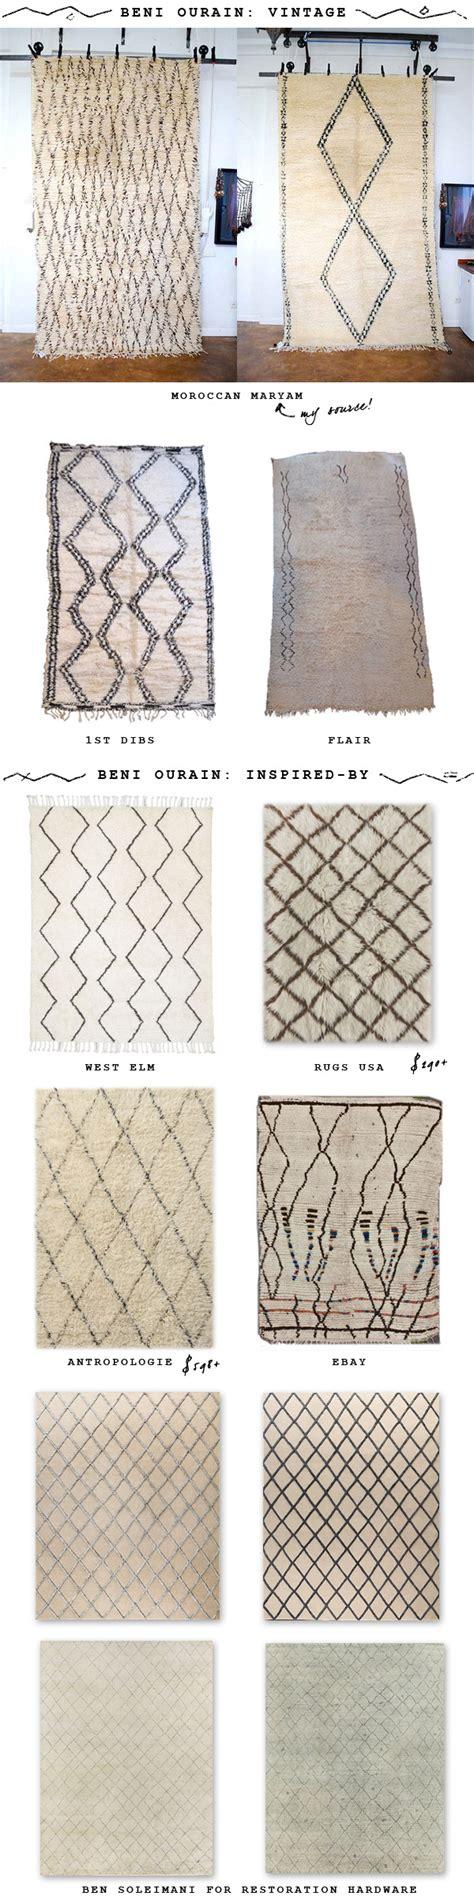 beni ourain style rug design the influence beni ourain rugs la dolce vita